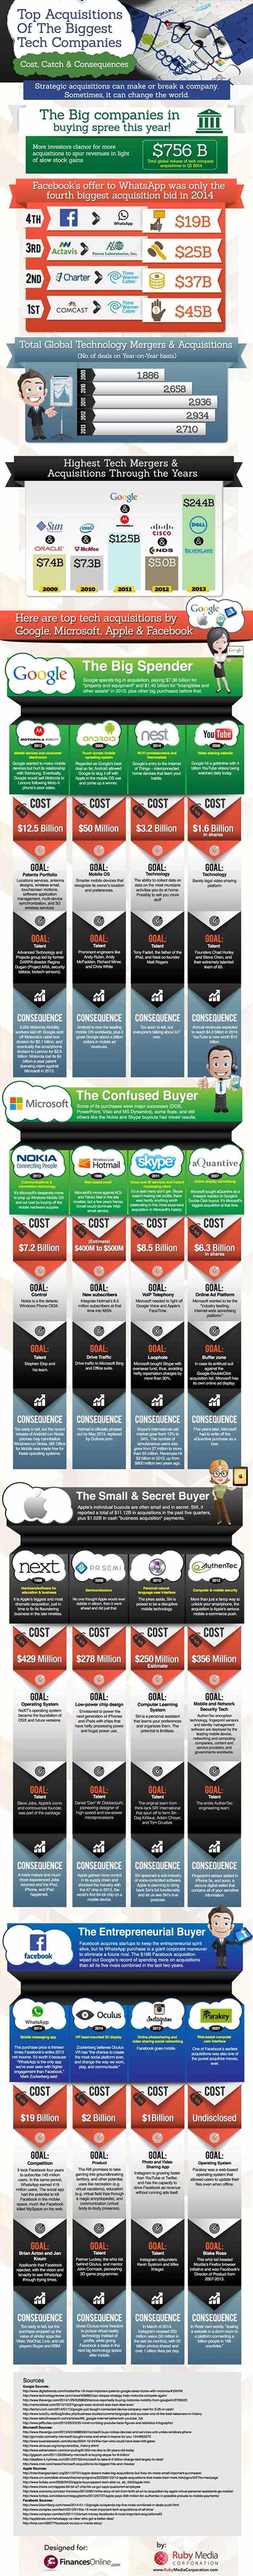 "Infografia sobre las 4 compañias ""mas gastonas"" del panorama tecnologico"